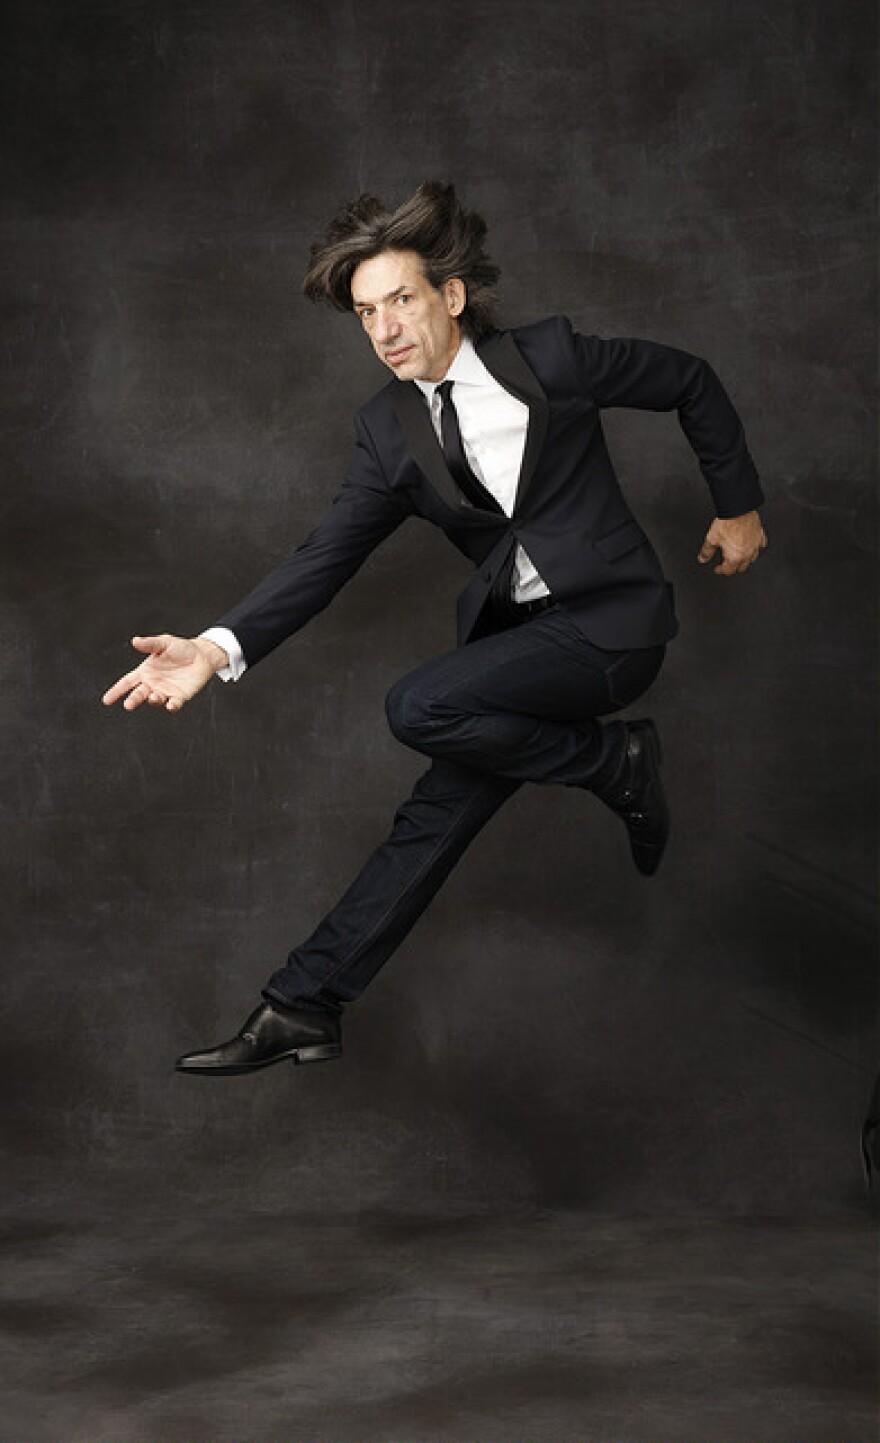 101018_lh_septime_webre_by_dean_alexander_courtesy_the_washington_ballet.jpg